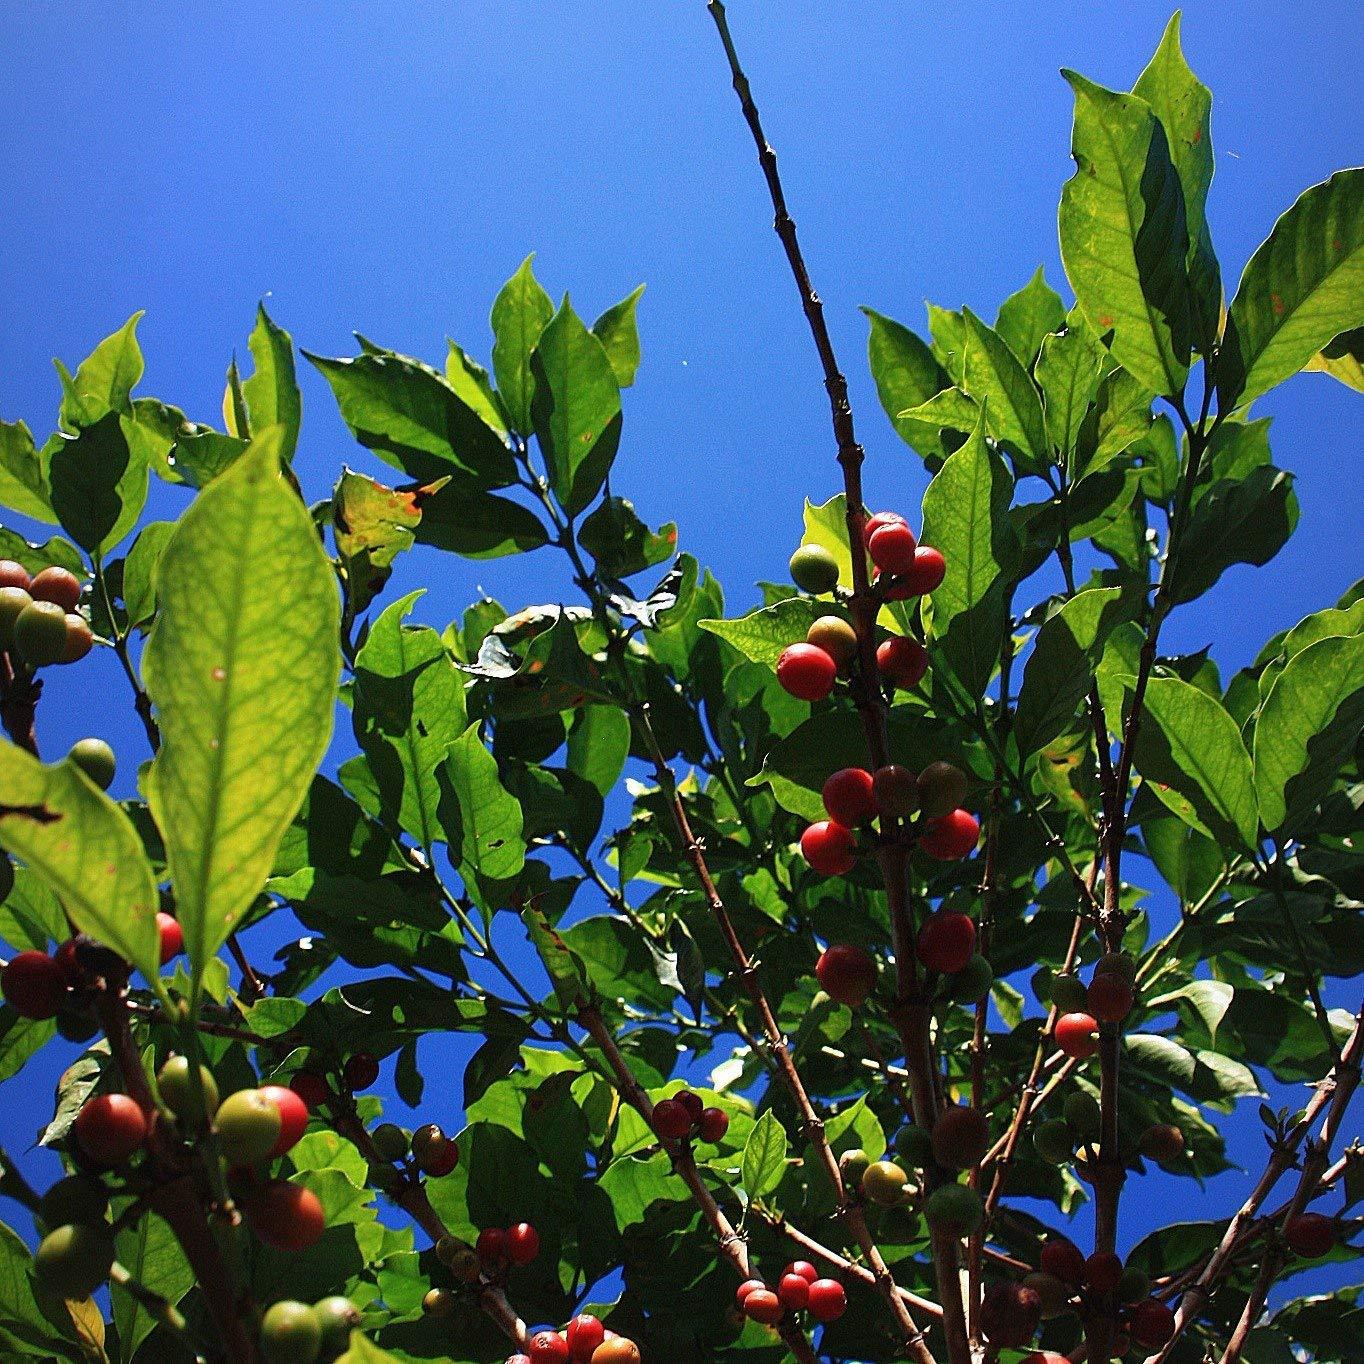 5 LBS Brazil Rancho Grande Unroasted Green Coffee Beans